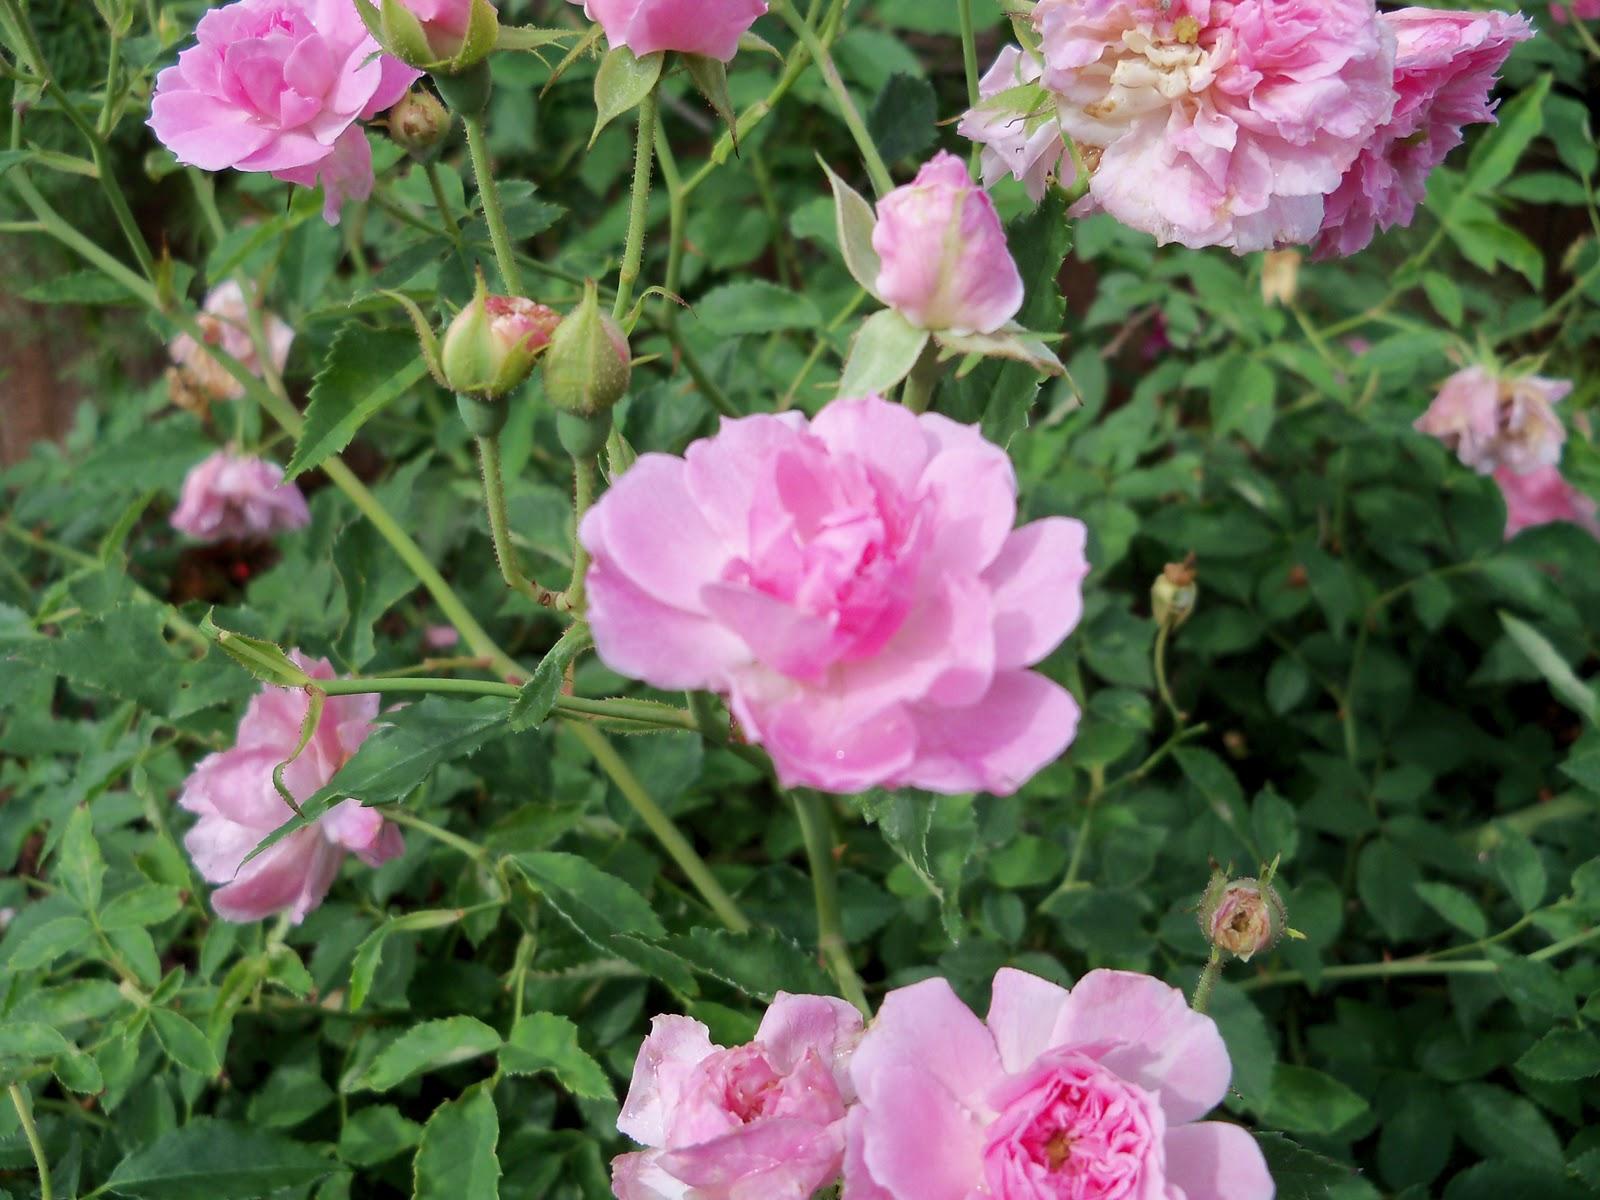 Gardening 2010, Part Two - 101_2185.JPG